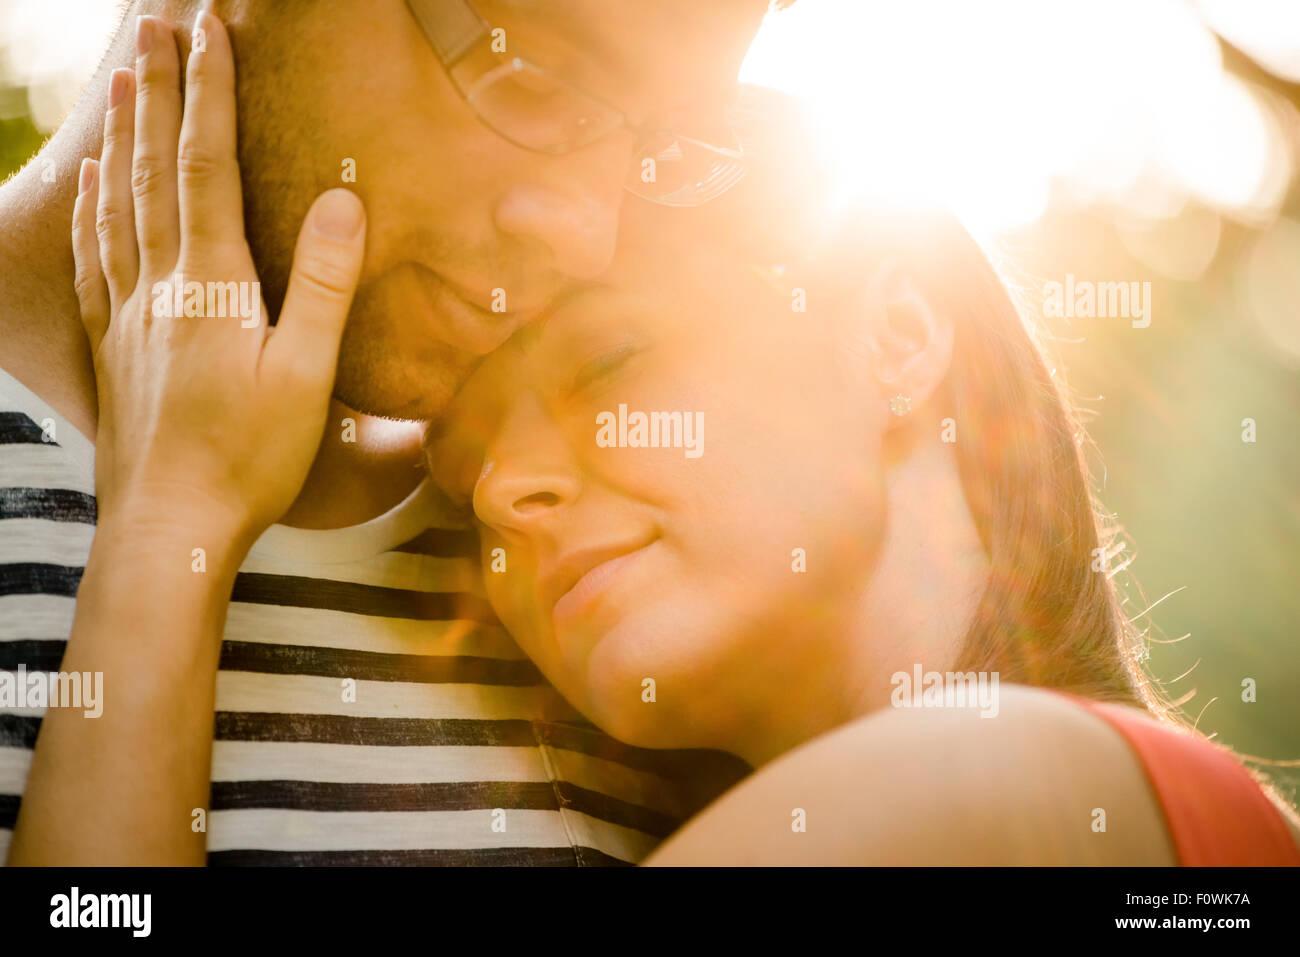 Momentos íntimos - Pareja joven abrazar y abrazar en la naturaleza Imagen De Stock